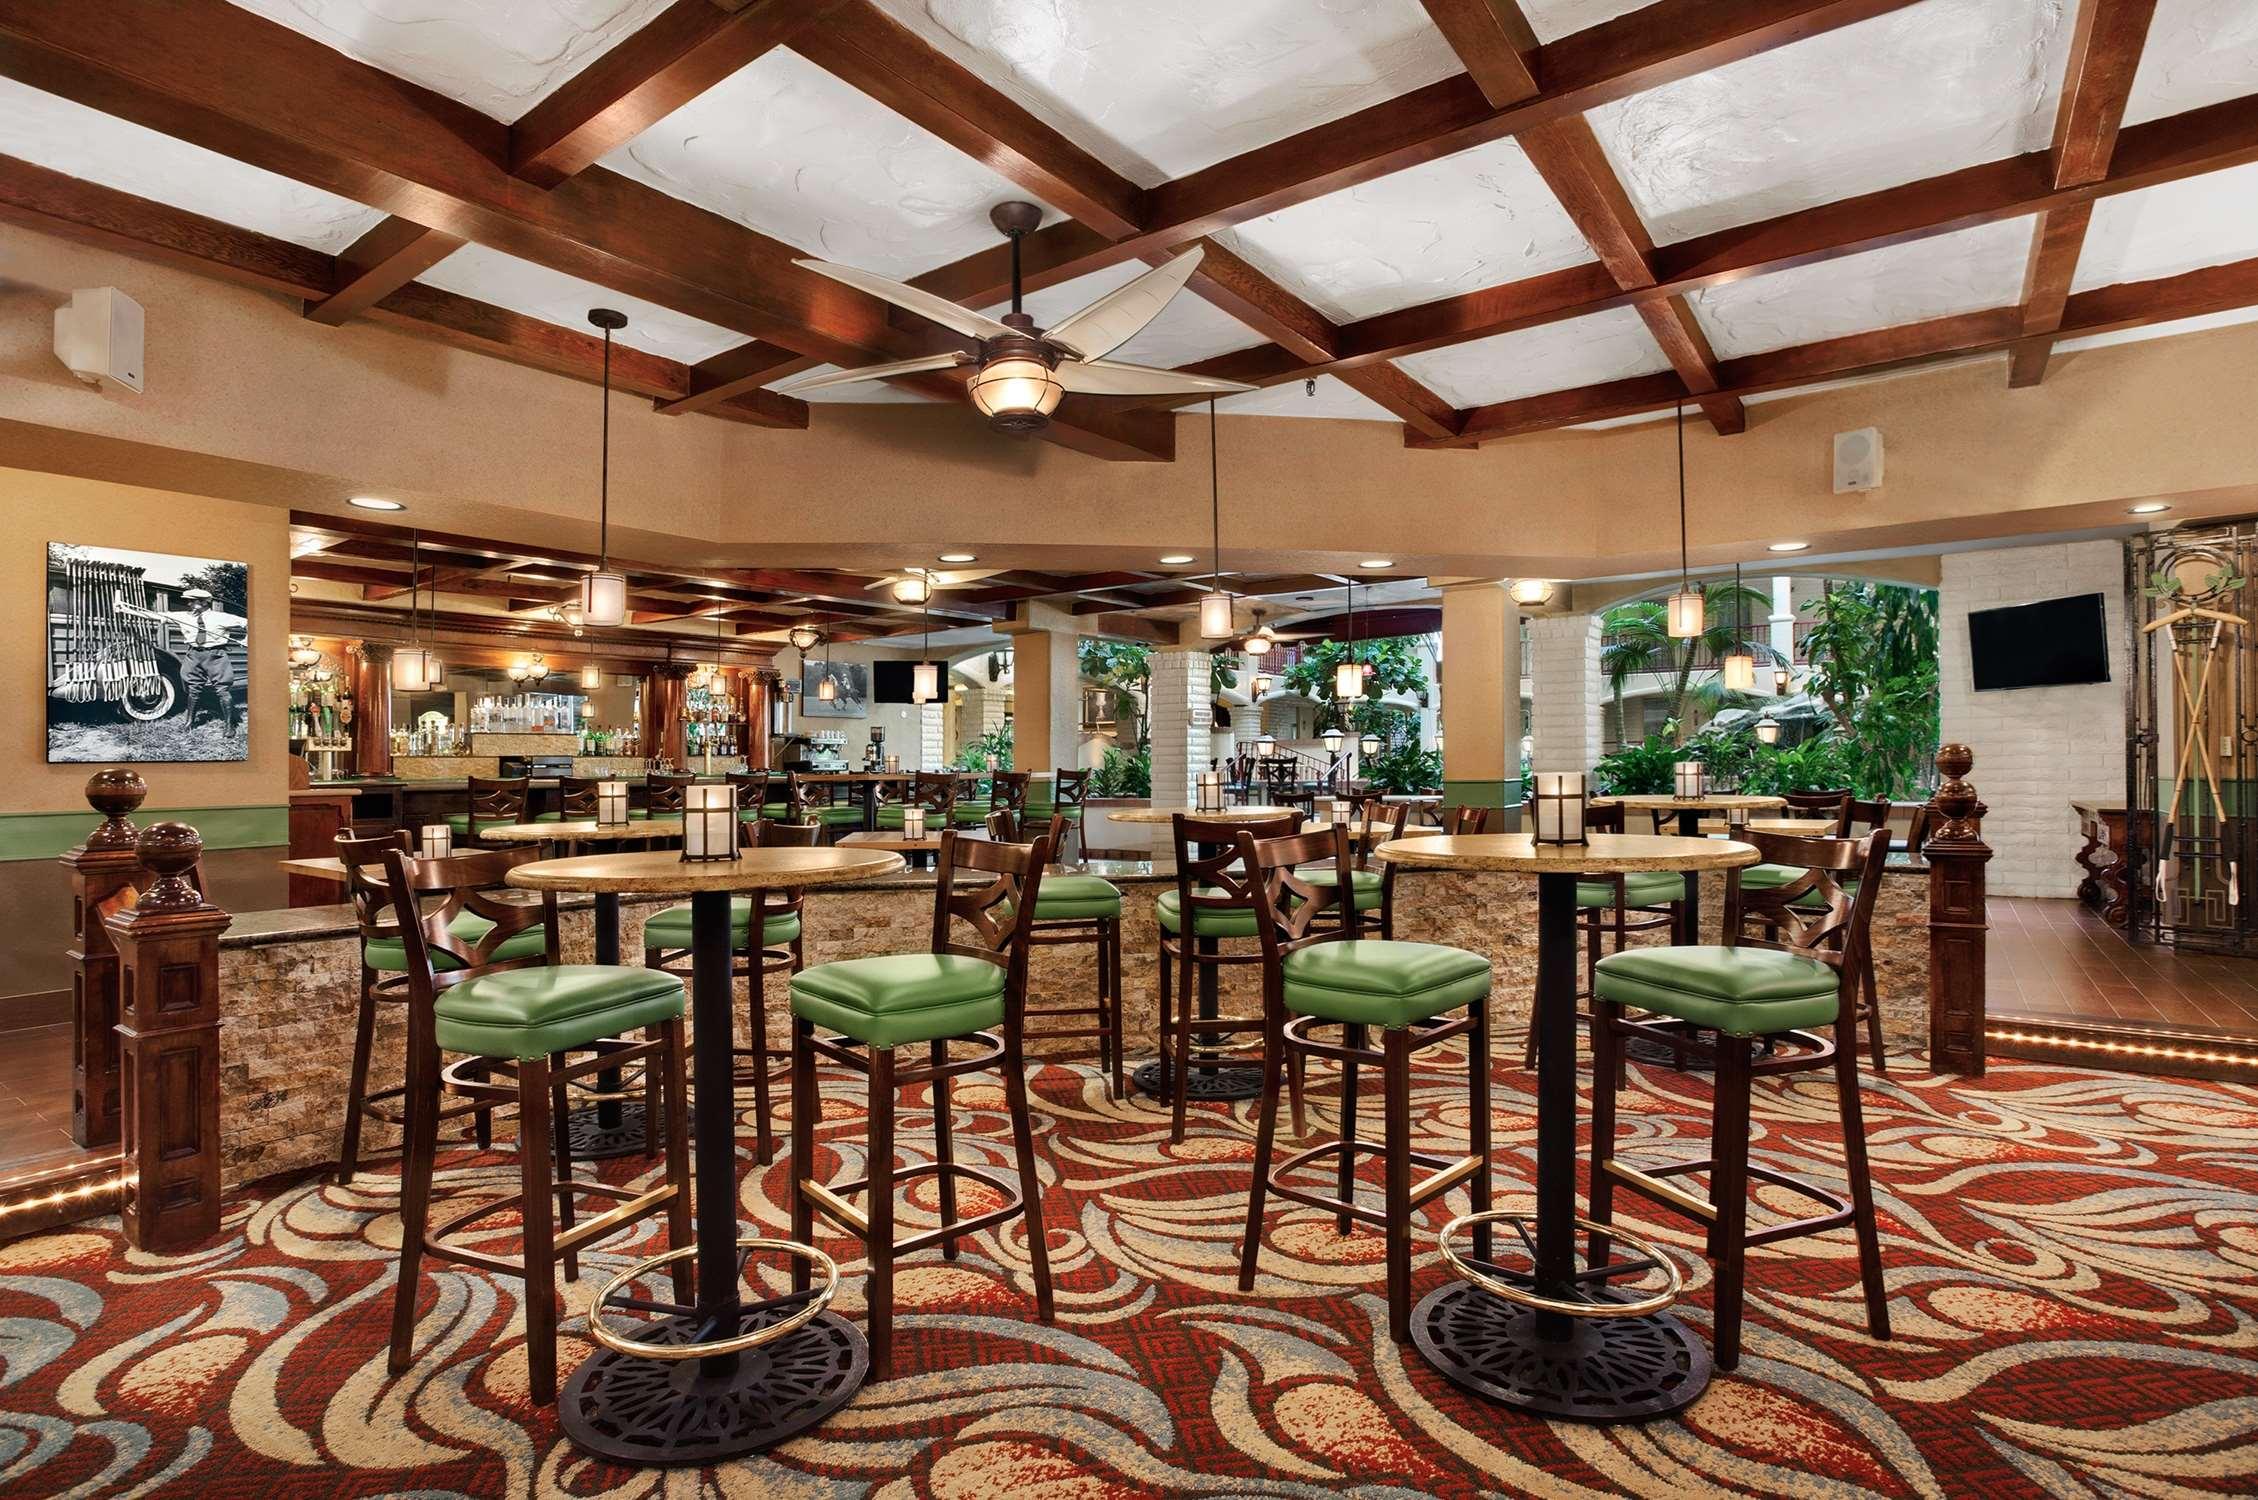 Embassy Suites by Hilton Arcadia Pasadena Area image 37